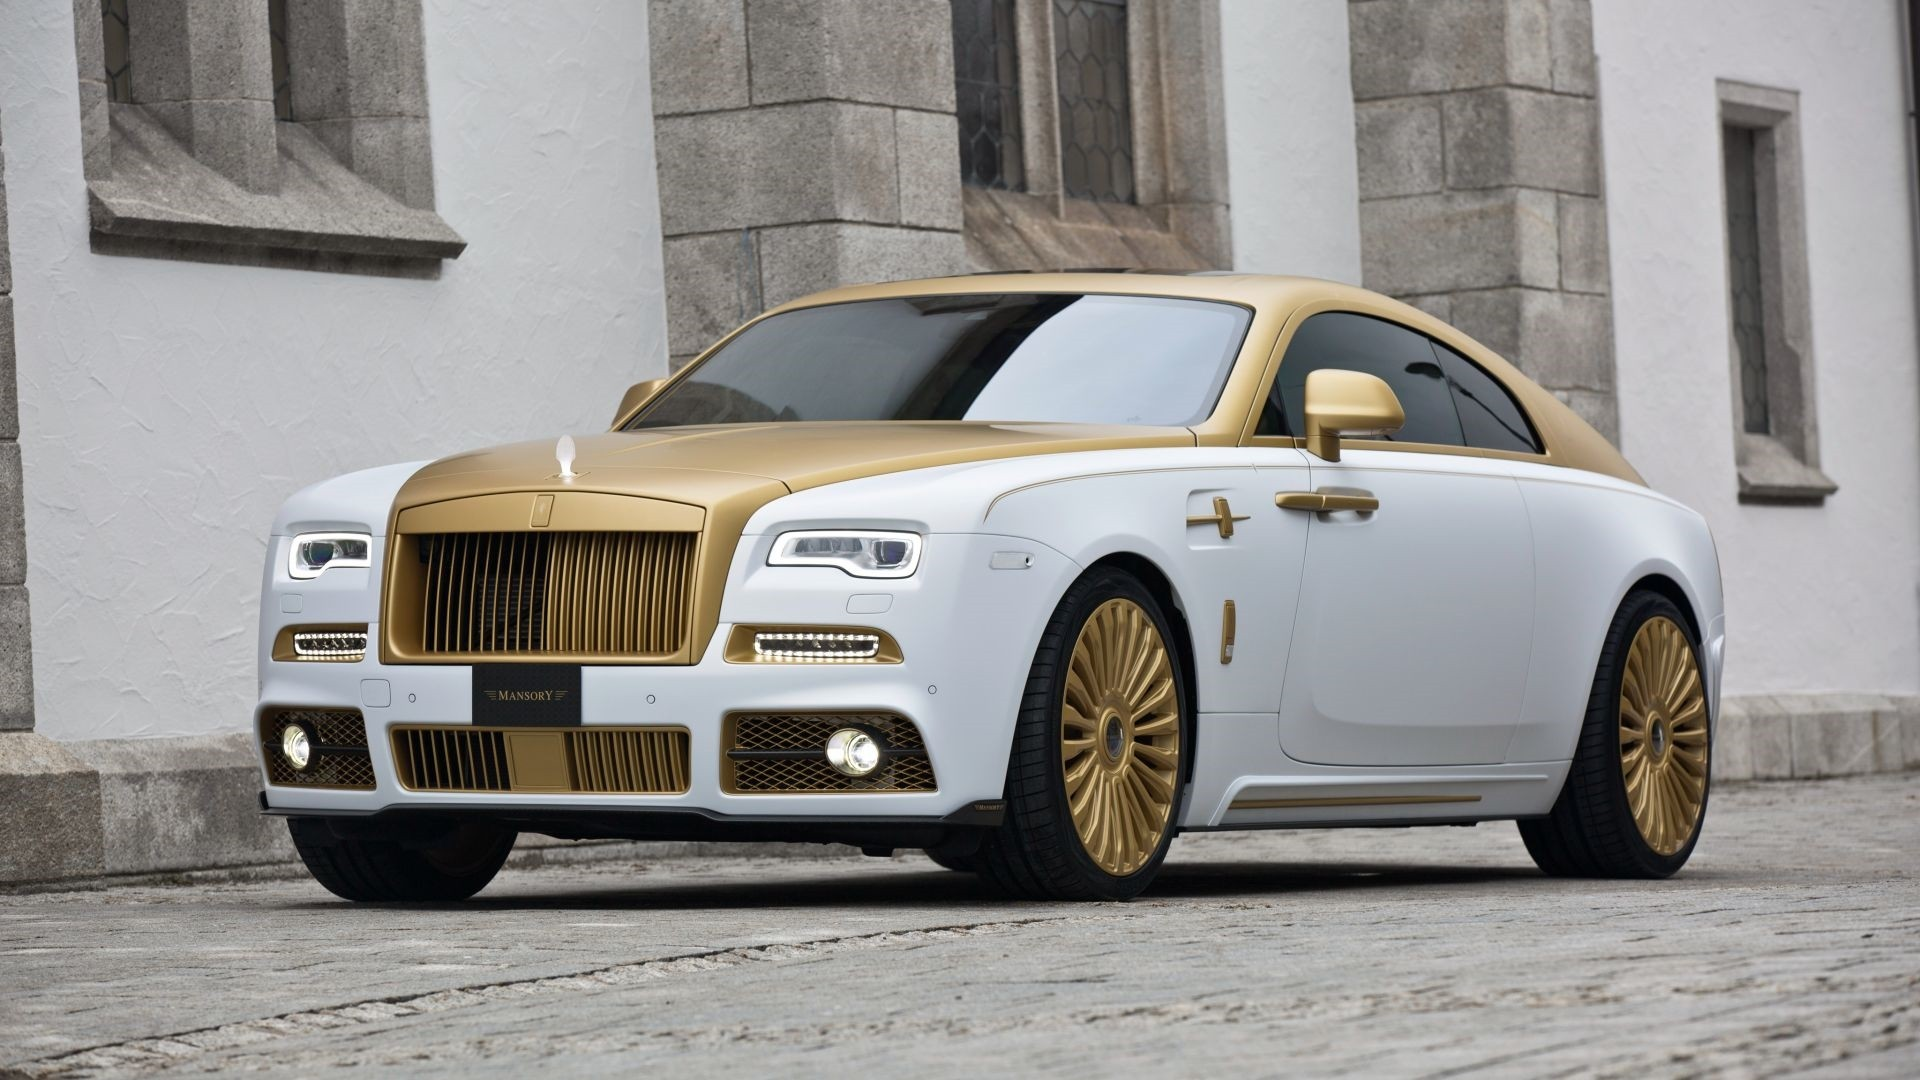 Rolls Royce Wraith Background